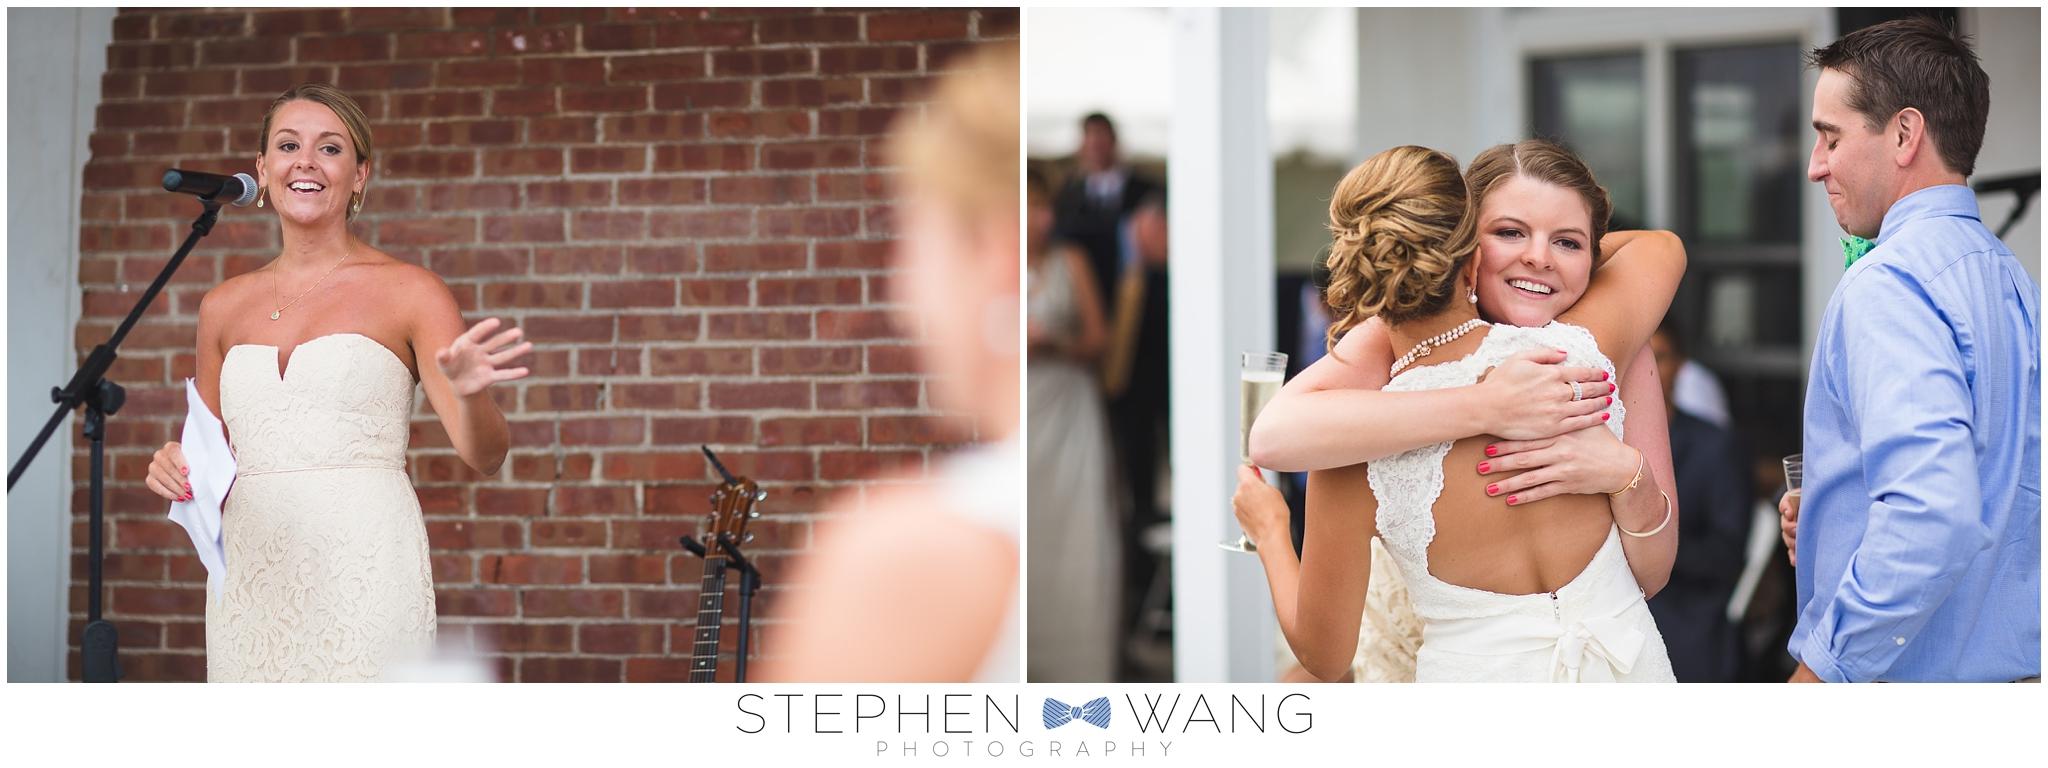 Stephen Wang Photography Madison Surf Club Wedding Photogrpahy CT Connecticut Shoreline Beach Summer Sunset -08-12_0026.jpg